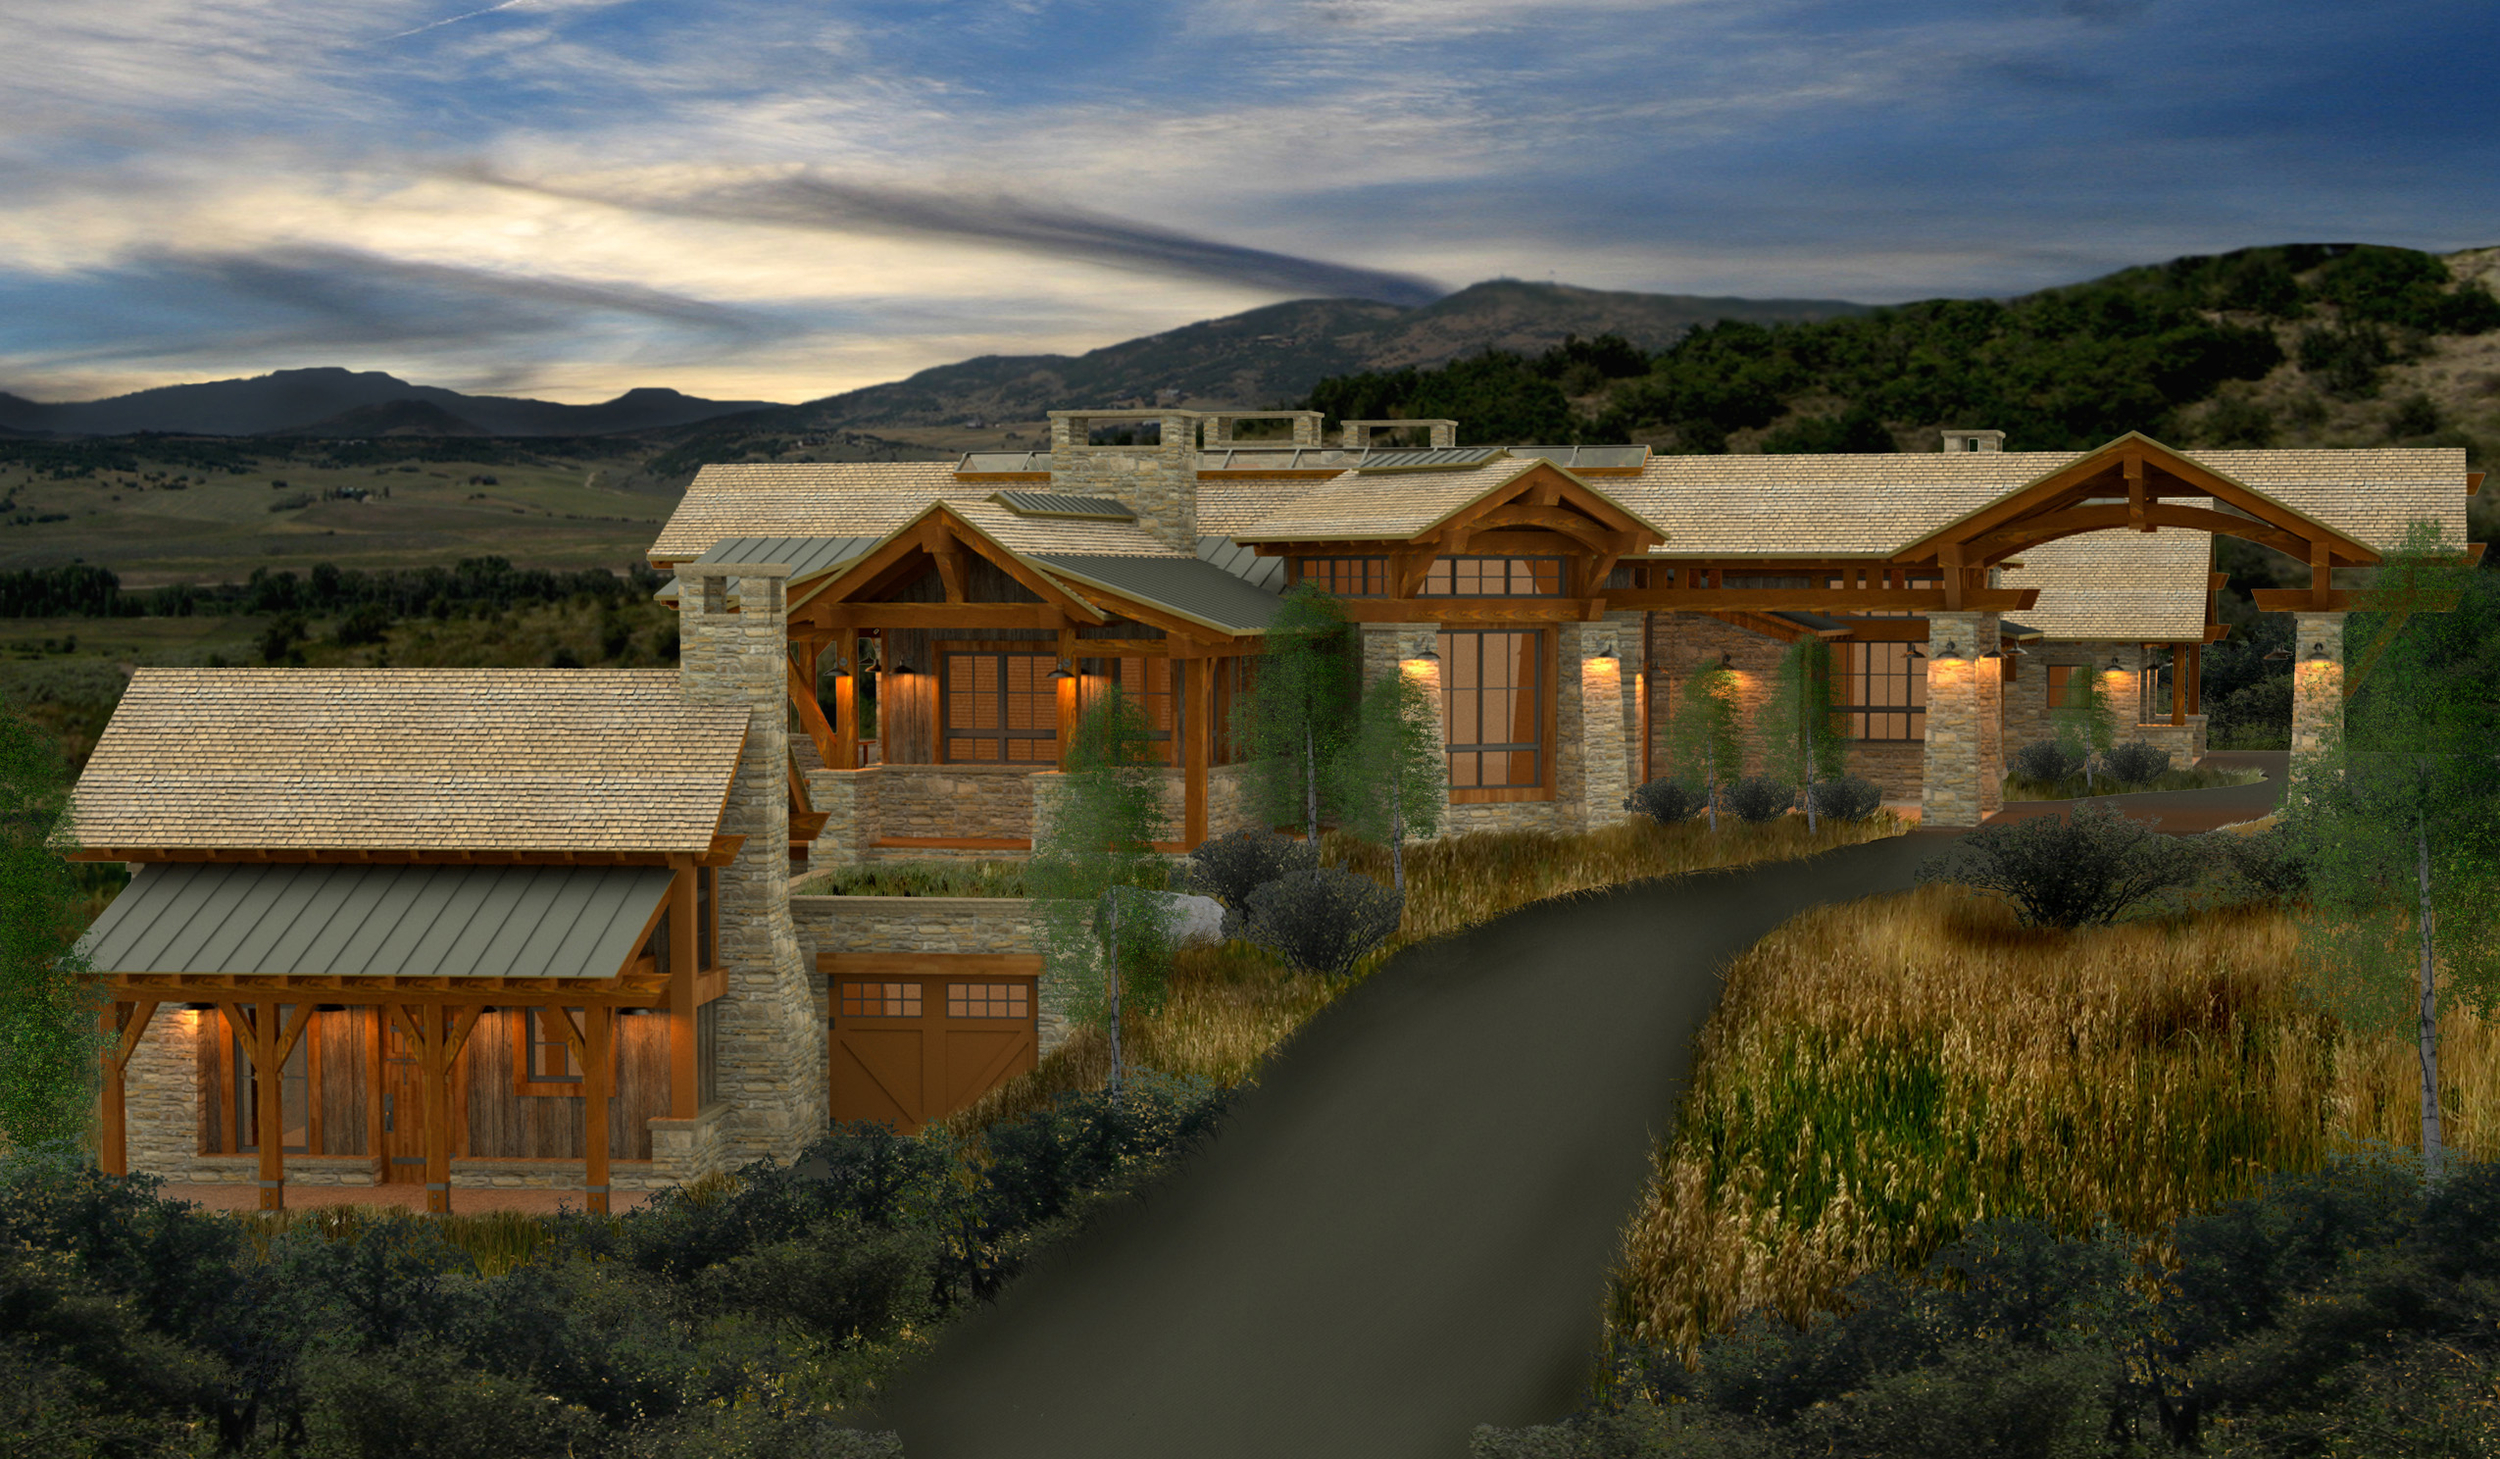 Colorado mountain ranch sustainable architect - 02.jpg